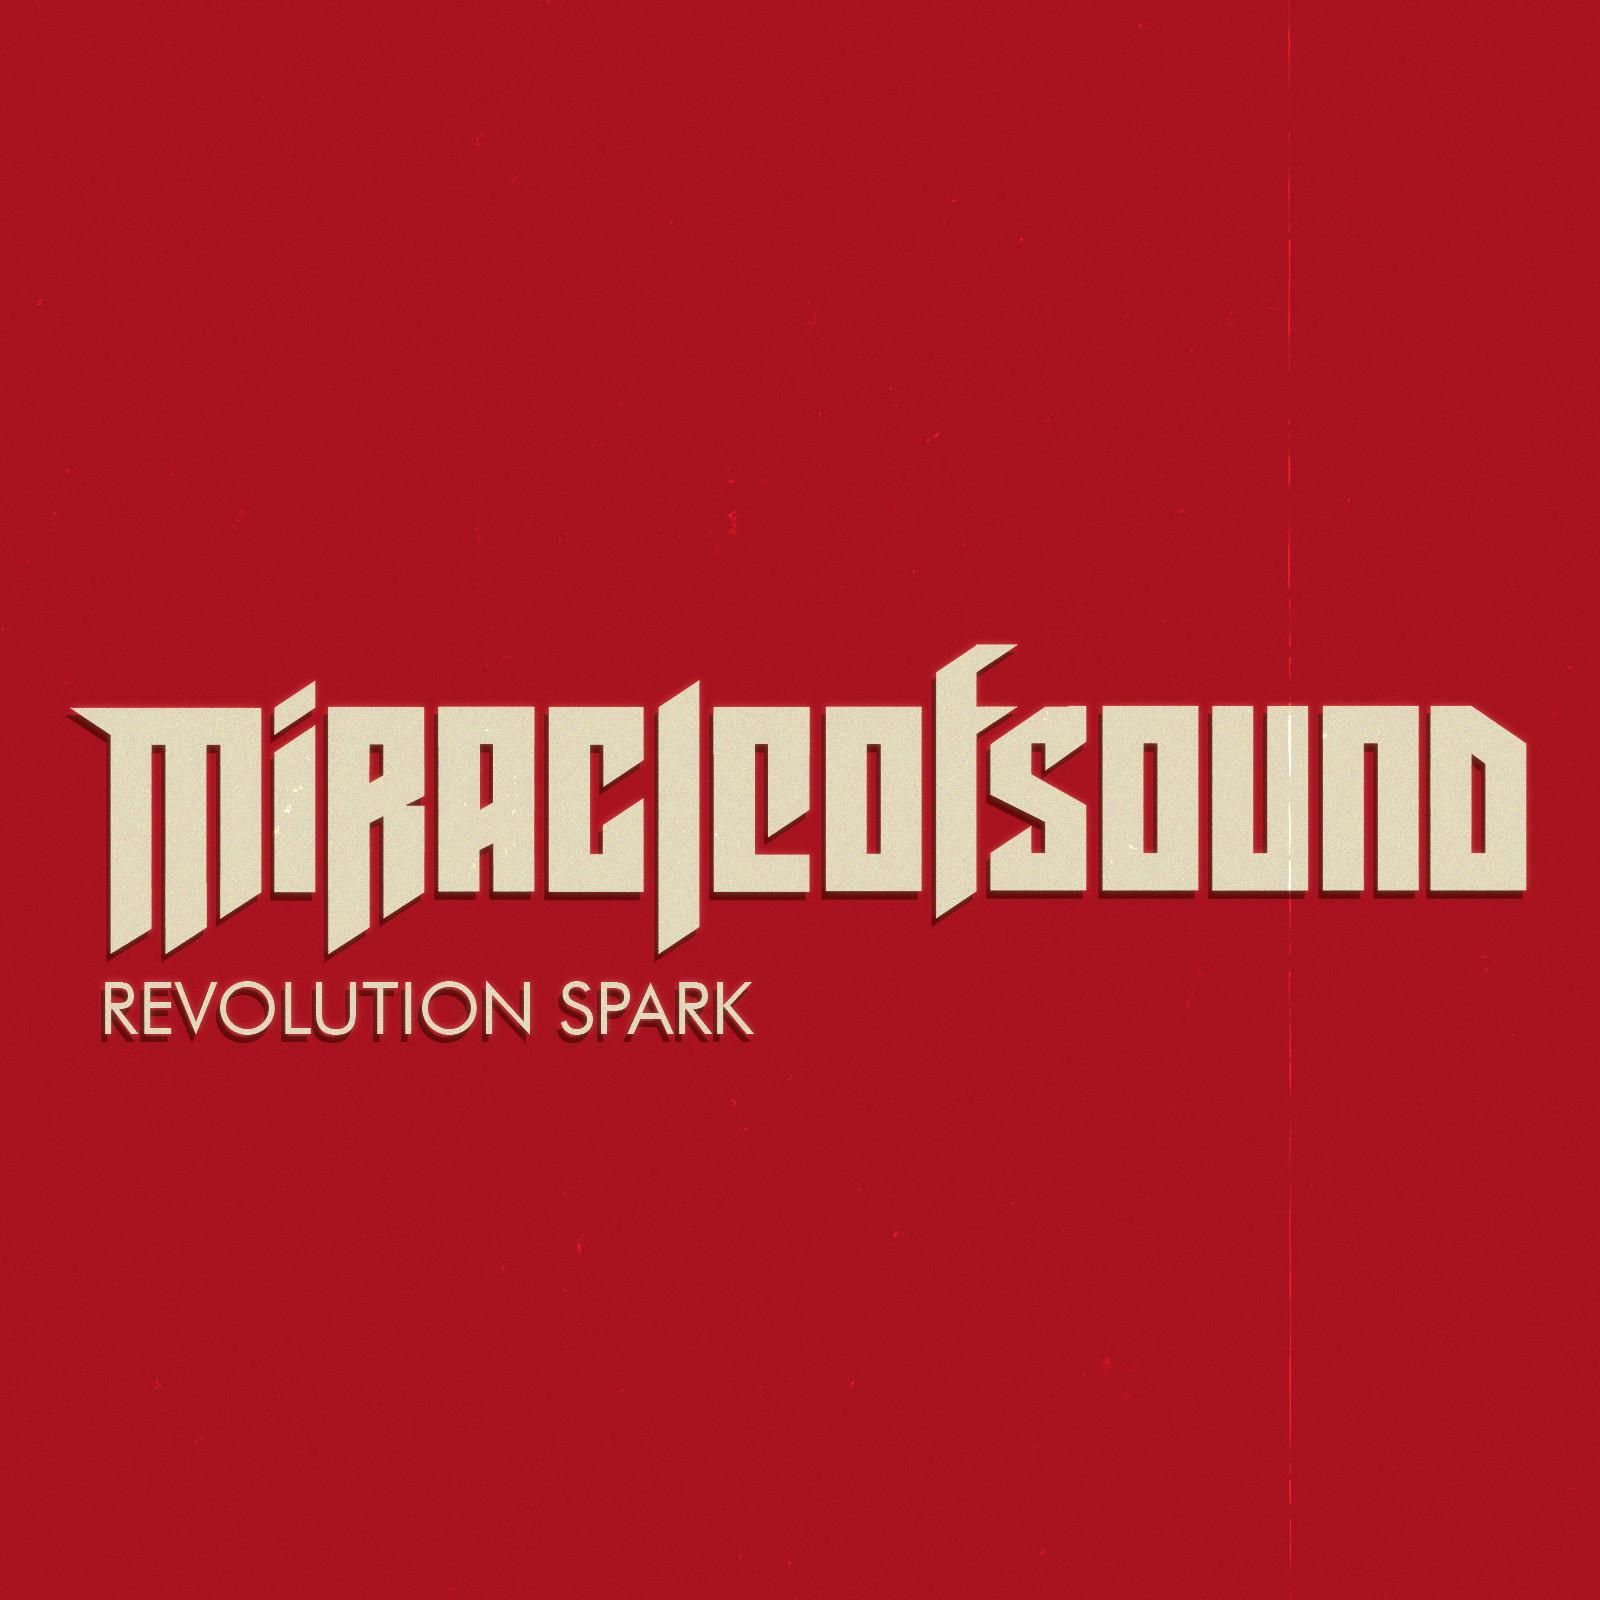 Alfred khamidullin revolution spark3